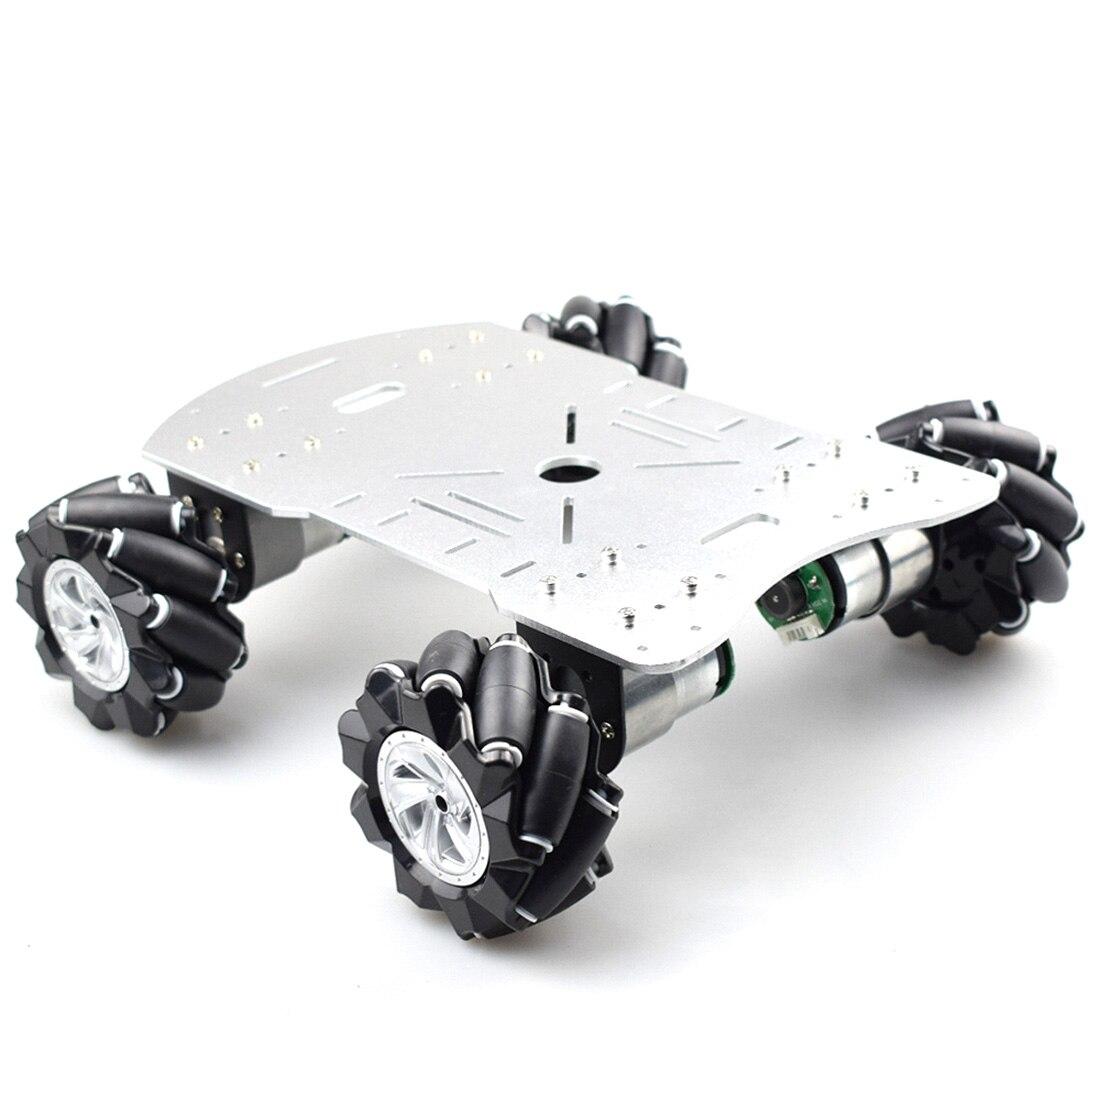 New 80mm Mecanum Metal Platform Kit DIY Omni-Directional Mecanum Wheel Robot Car Without Electronic Control - Silver